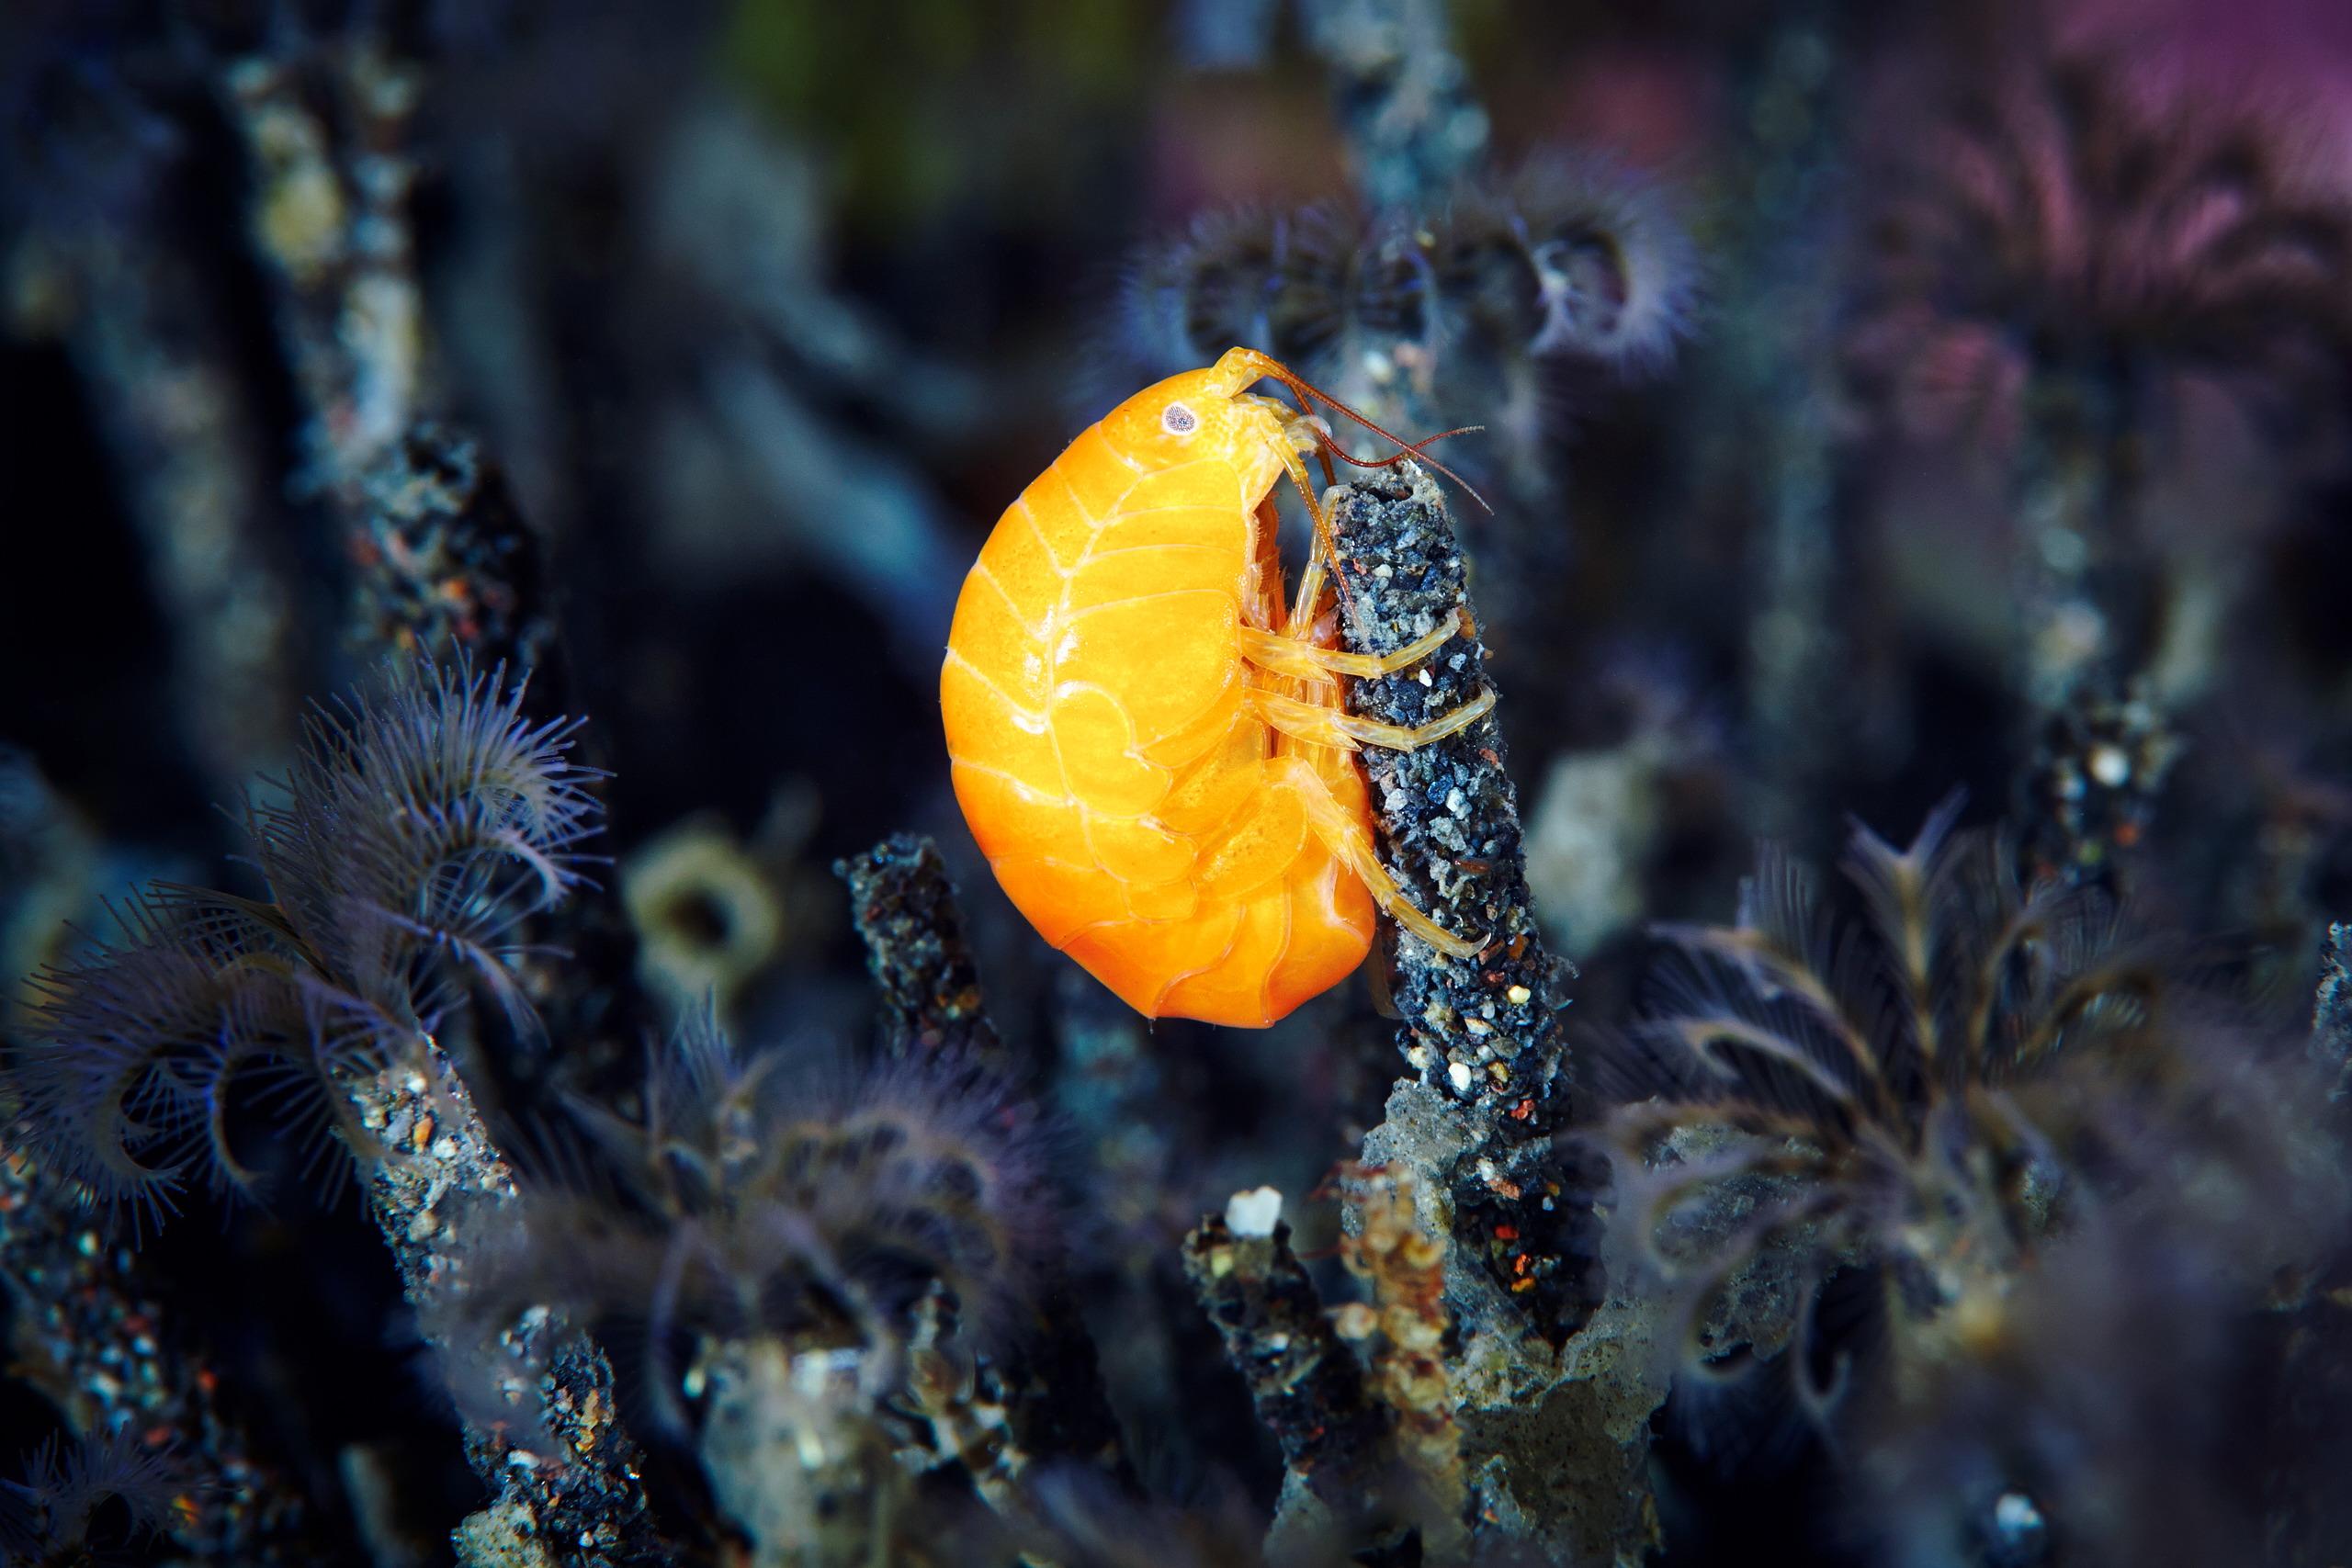 Unidentified amphipod